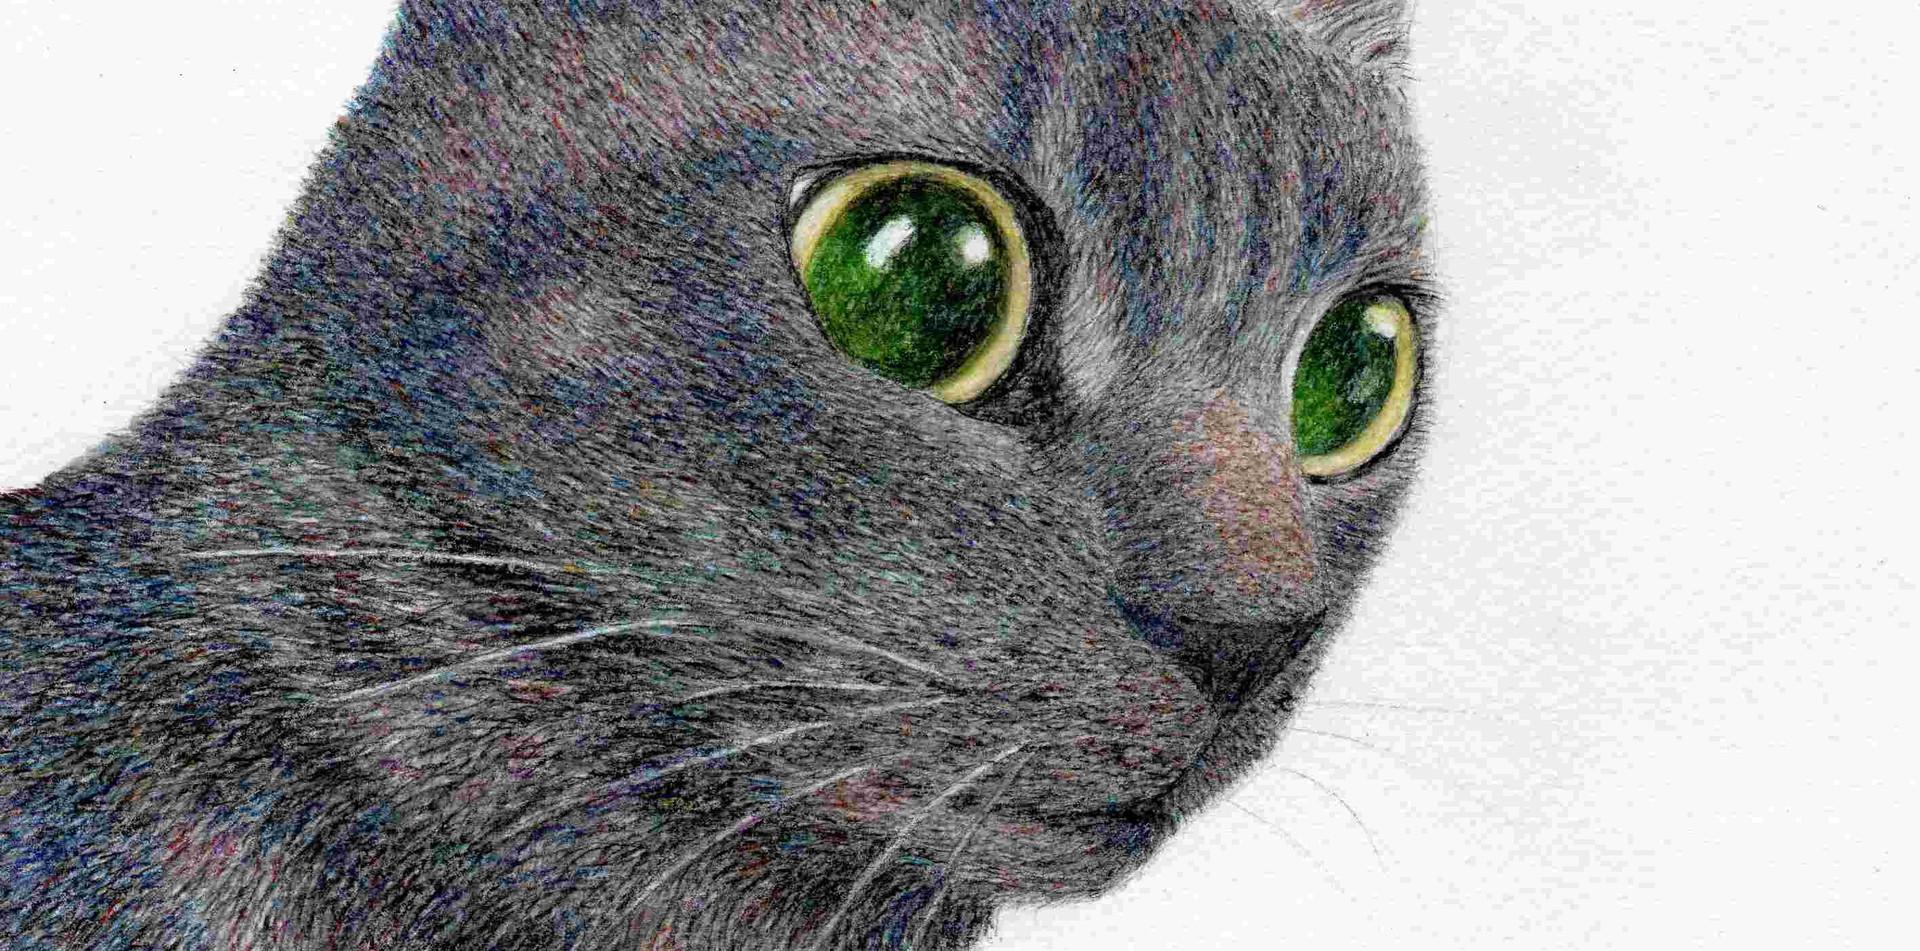 197 - Jack, A Black Cat